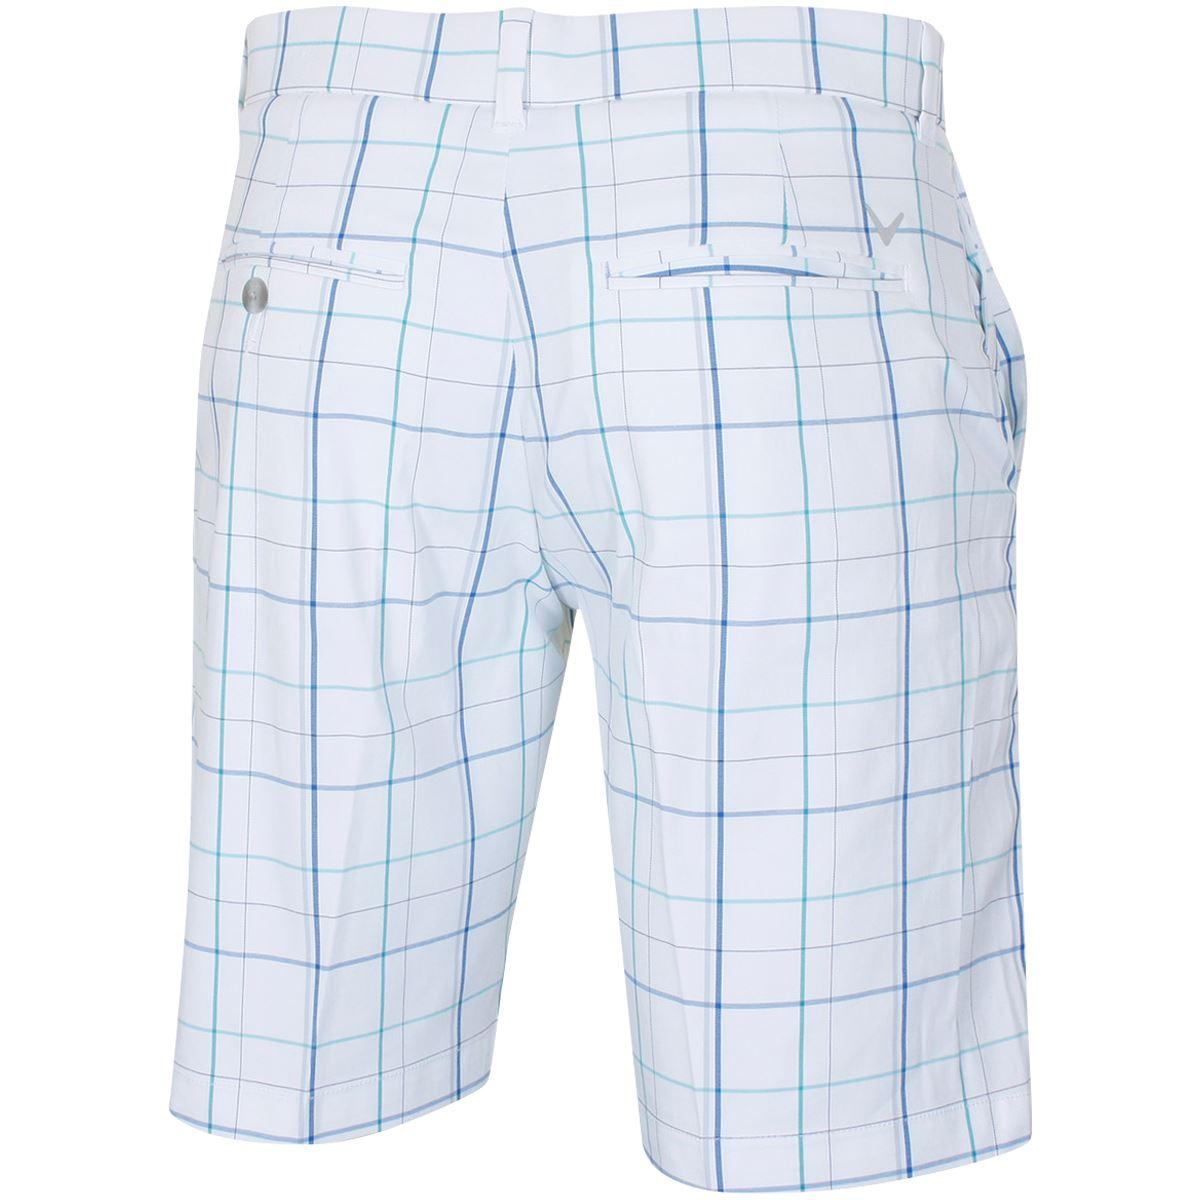 Callaway-Golf-Fashion-Plaid-Flat-Front-Mens-Stretch-Golf-Shorts thumbnail 5